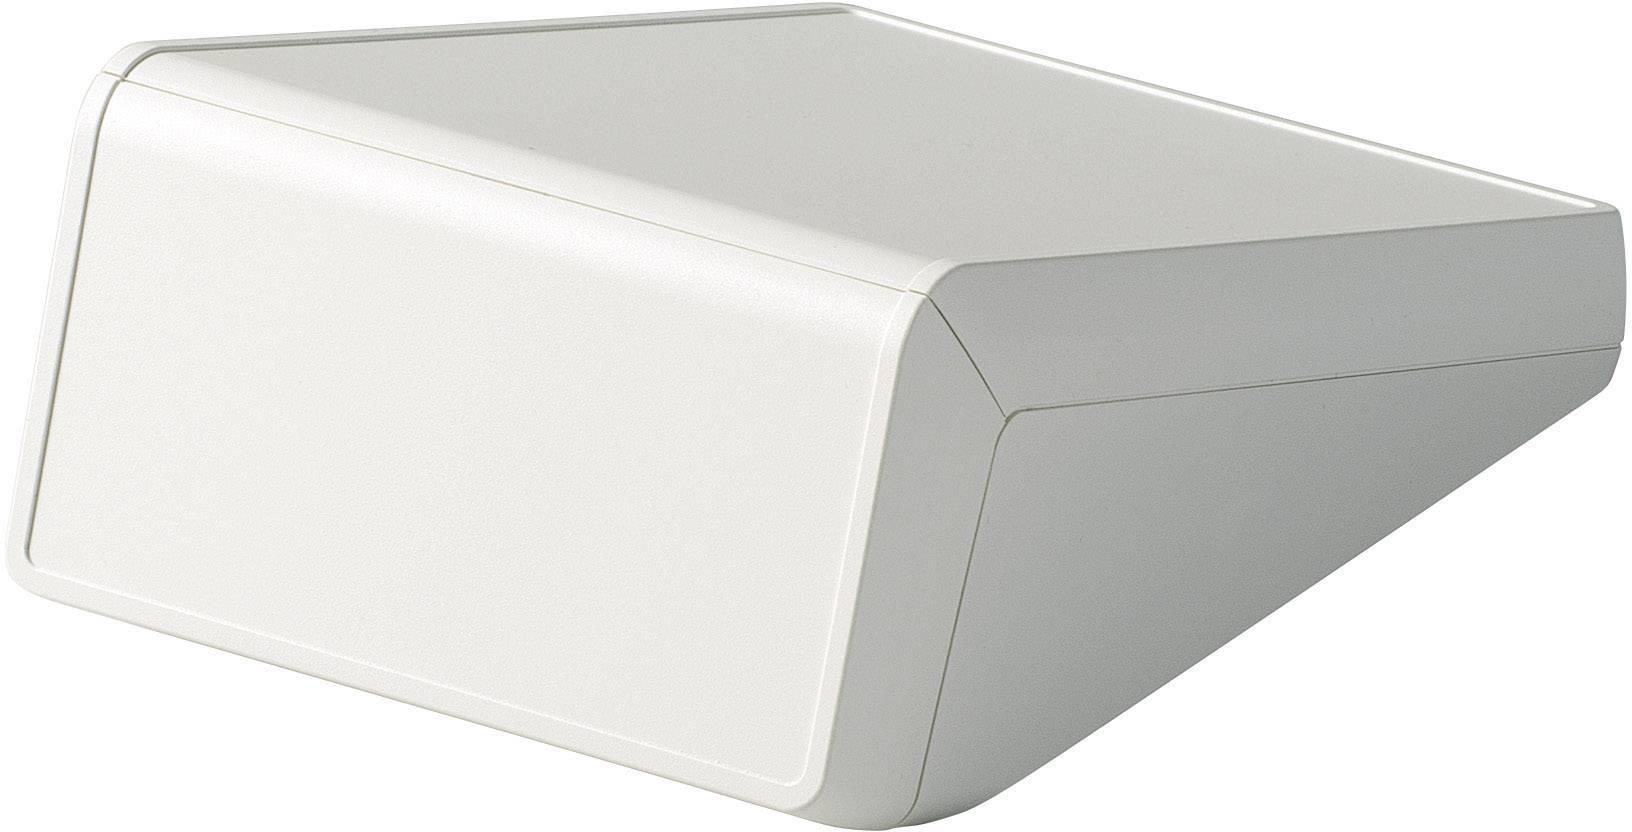 Pultové pouzdro ABS OKW D4056107, (d x š x v) 148 x 210 x 80/25 mm, šedá